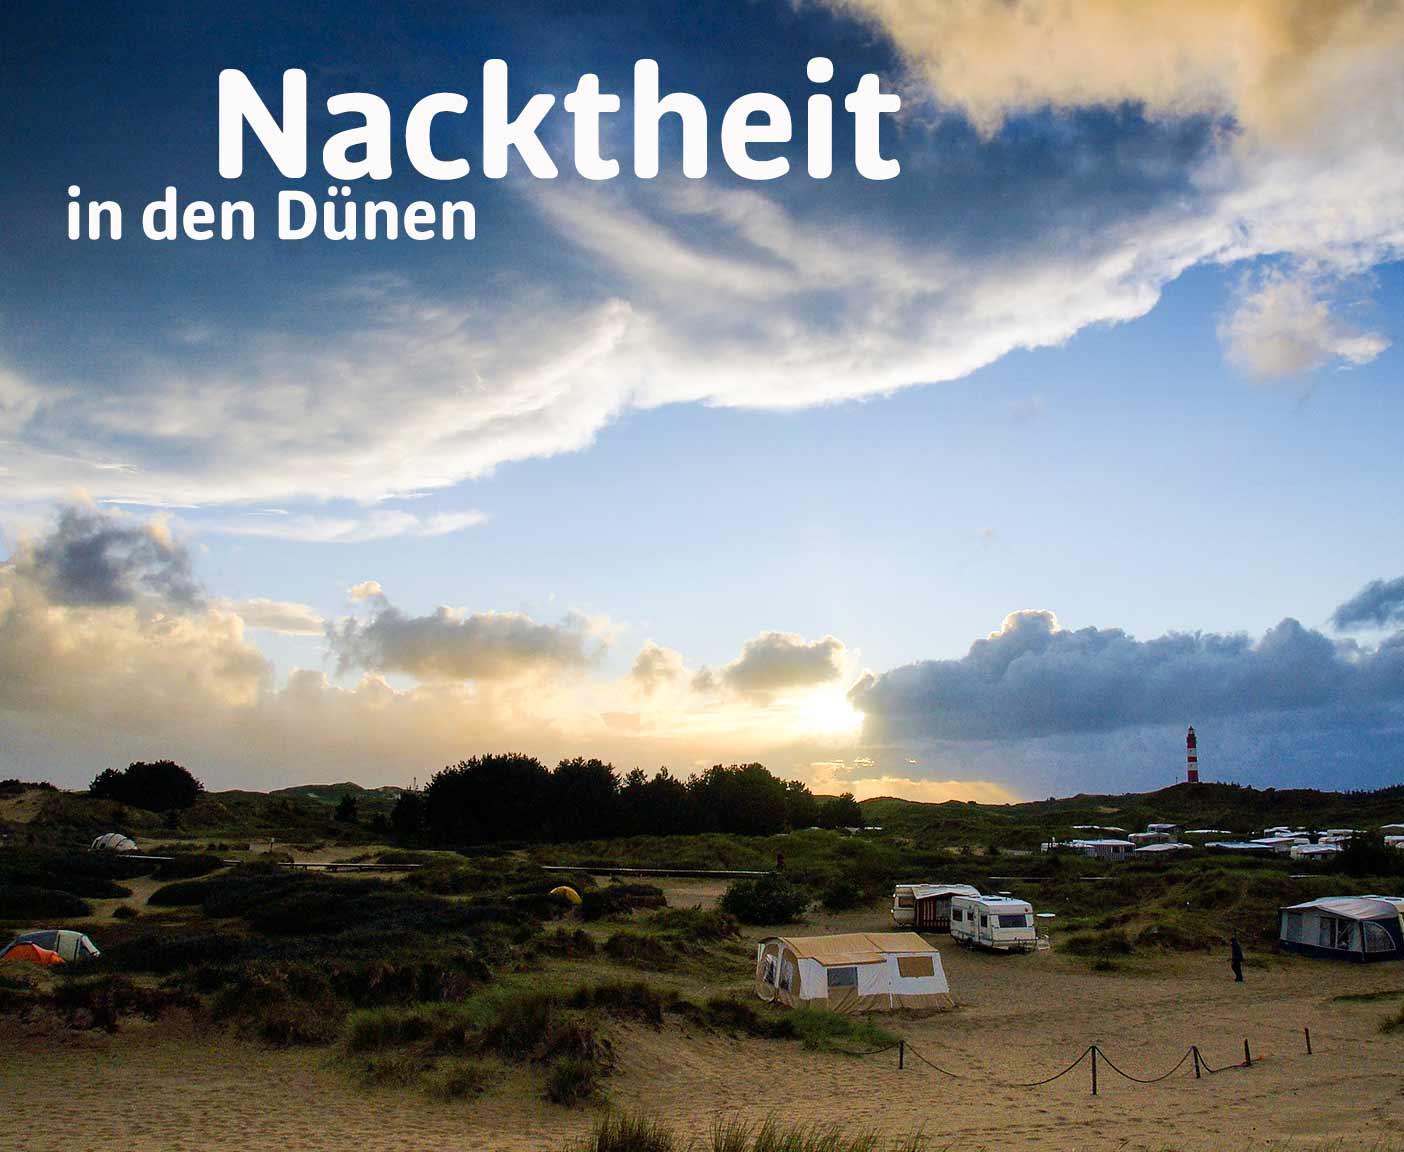 FKK-Camping Campingplatz Deutschland Ostsee in den Dünen, Leuchtturm,Sonnenuntergang, PaulCamper